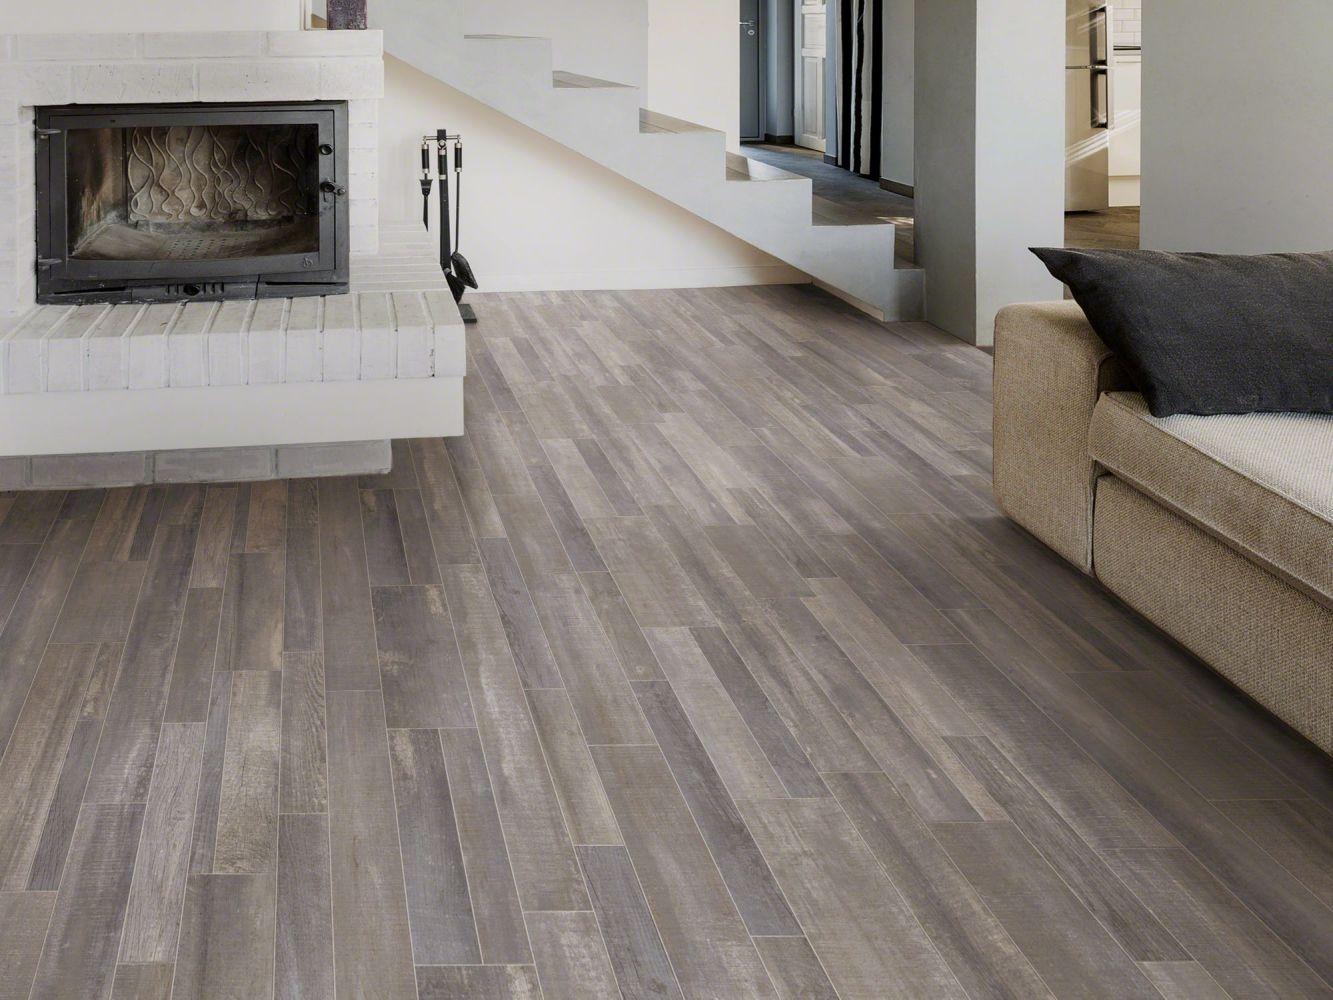 Shaw Floors Resilient Residential Plateau II Citadel 00560_527SA